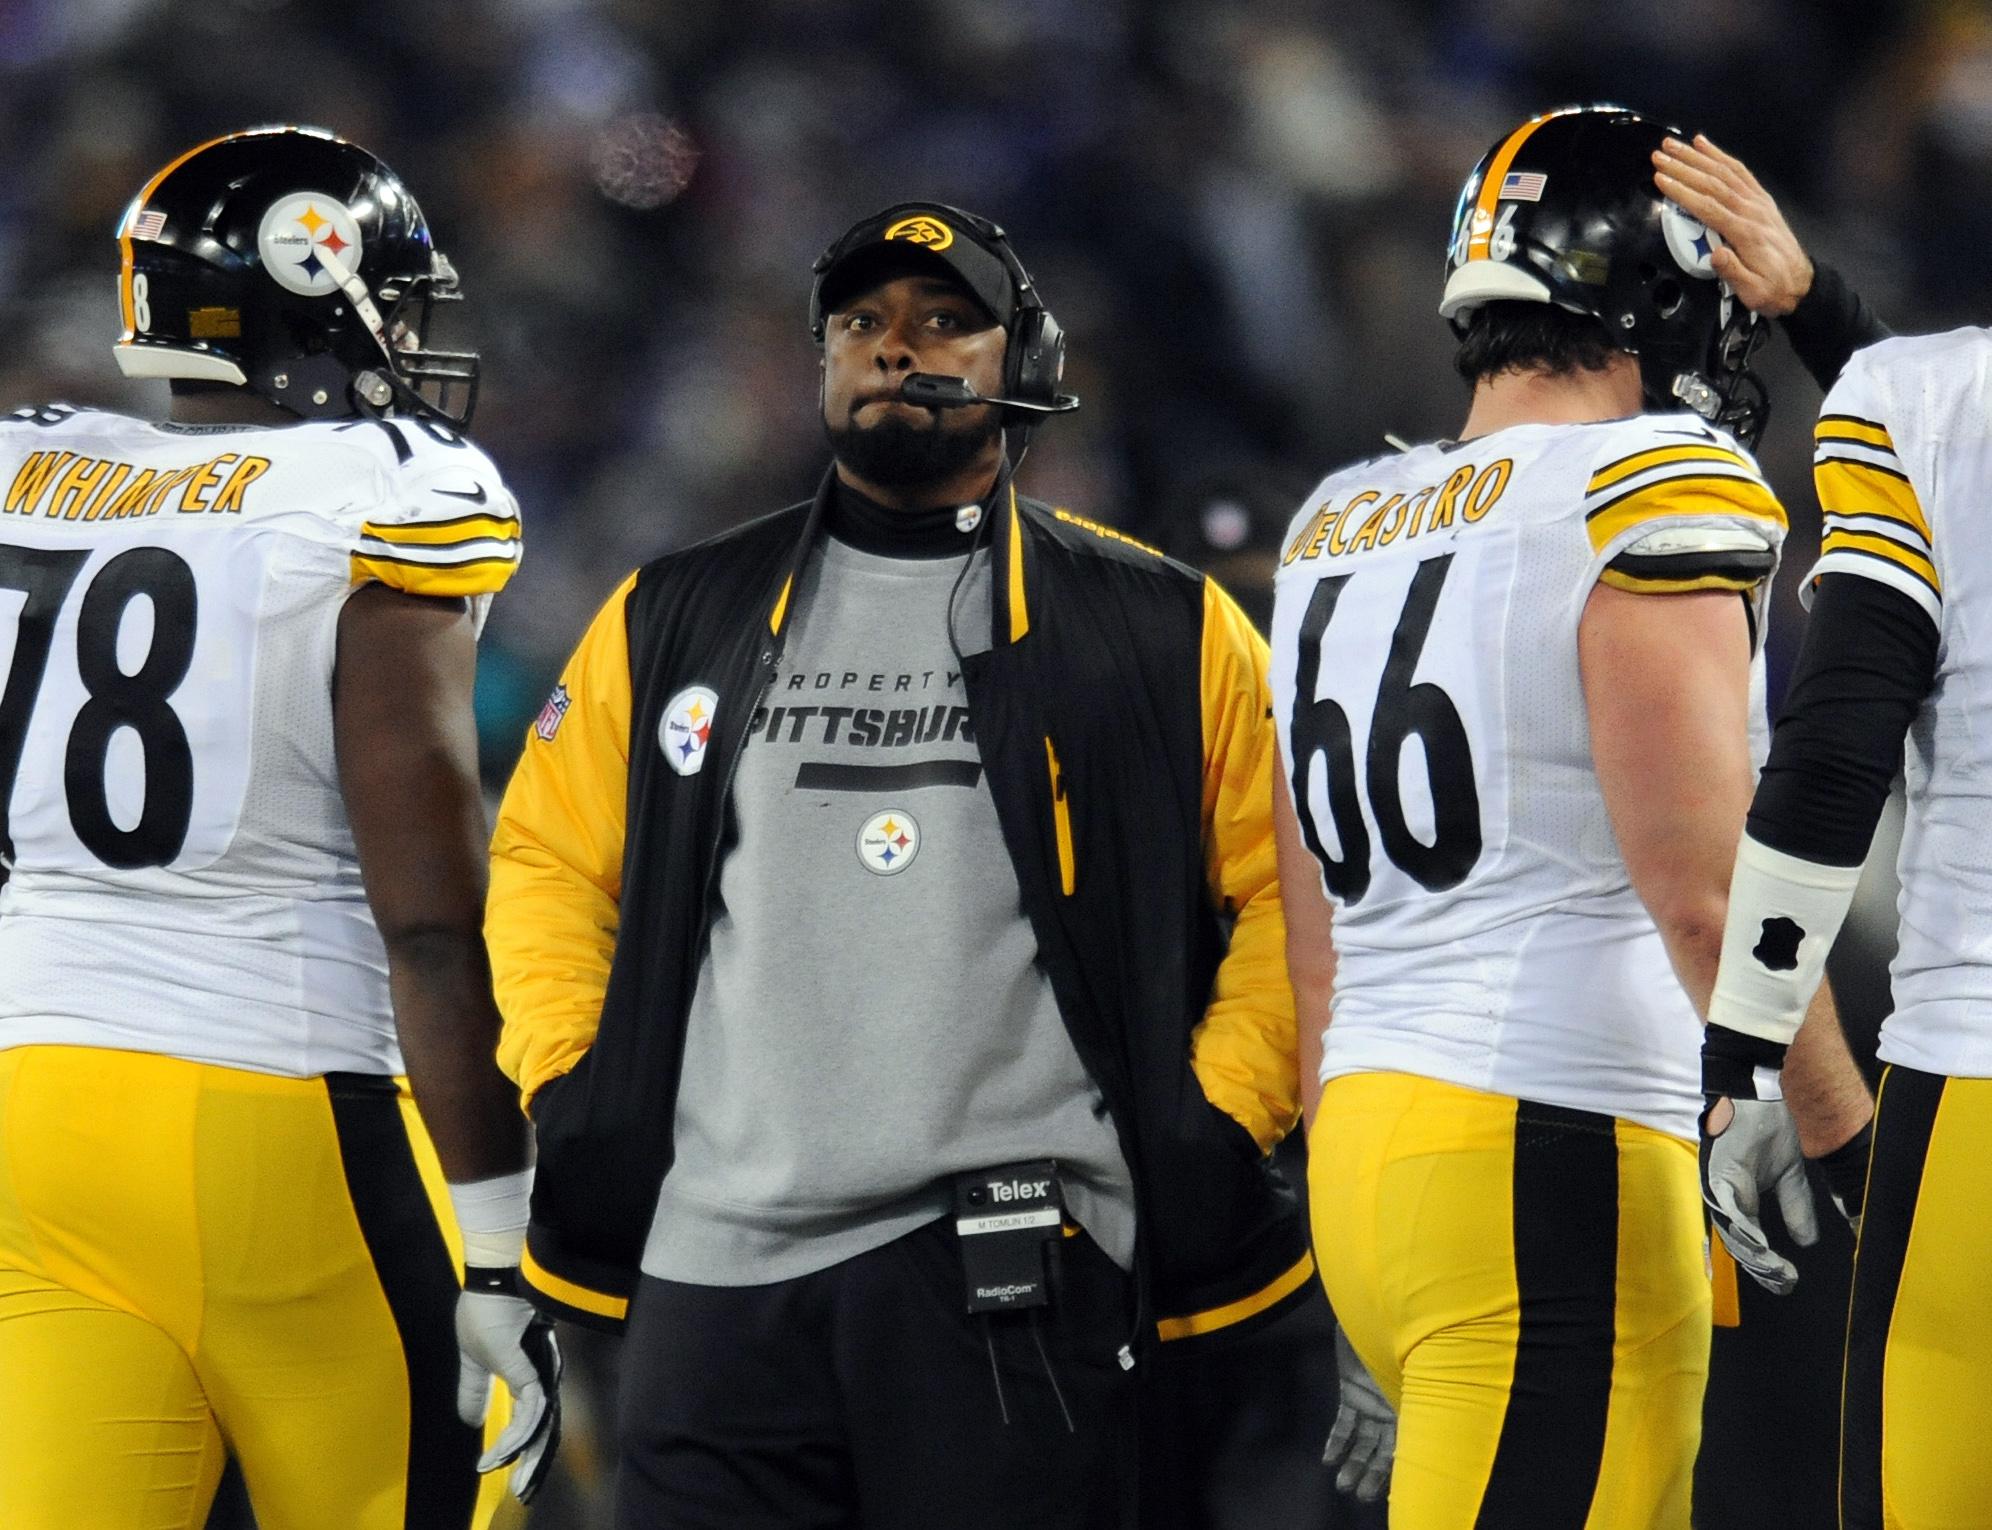 NFL fines Steelers coach Mike Tomlin $100,000